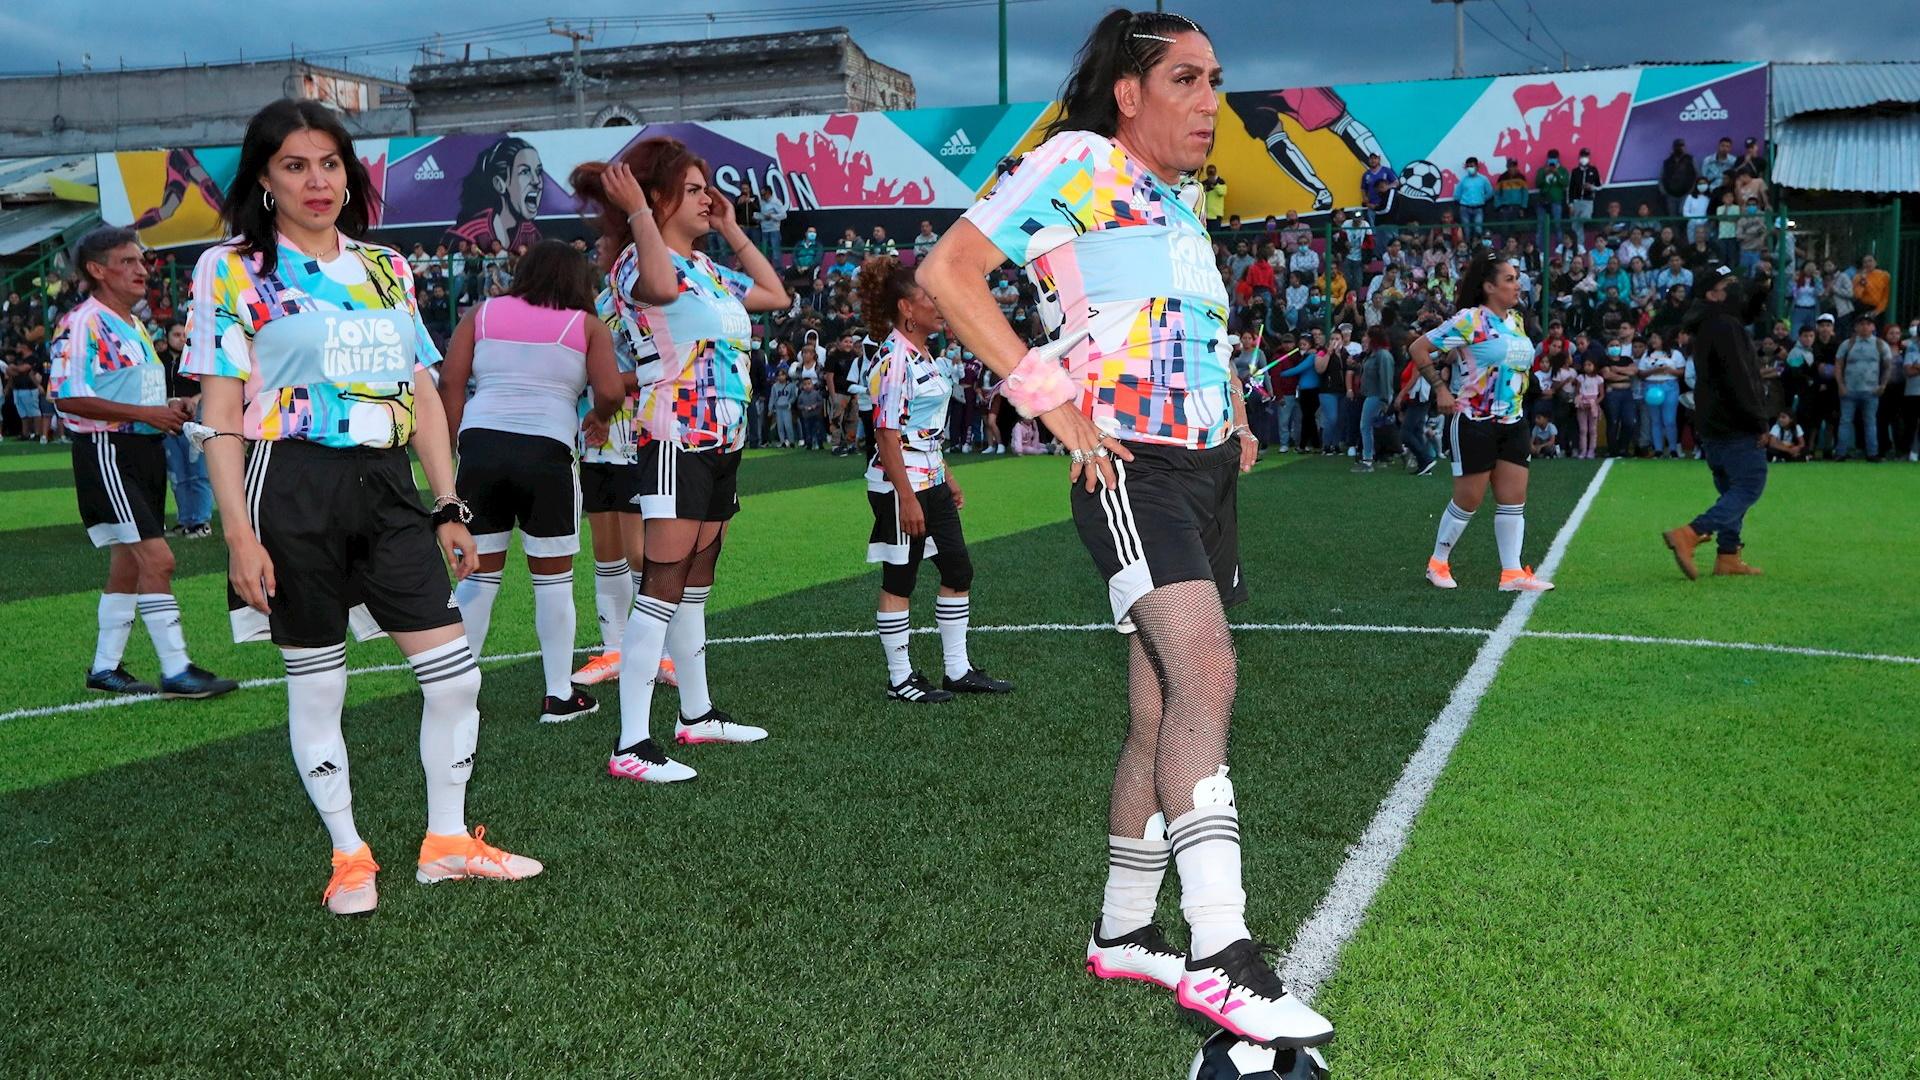 Las Gardenias Equipo Futbol trans tepito